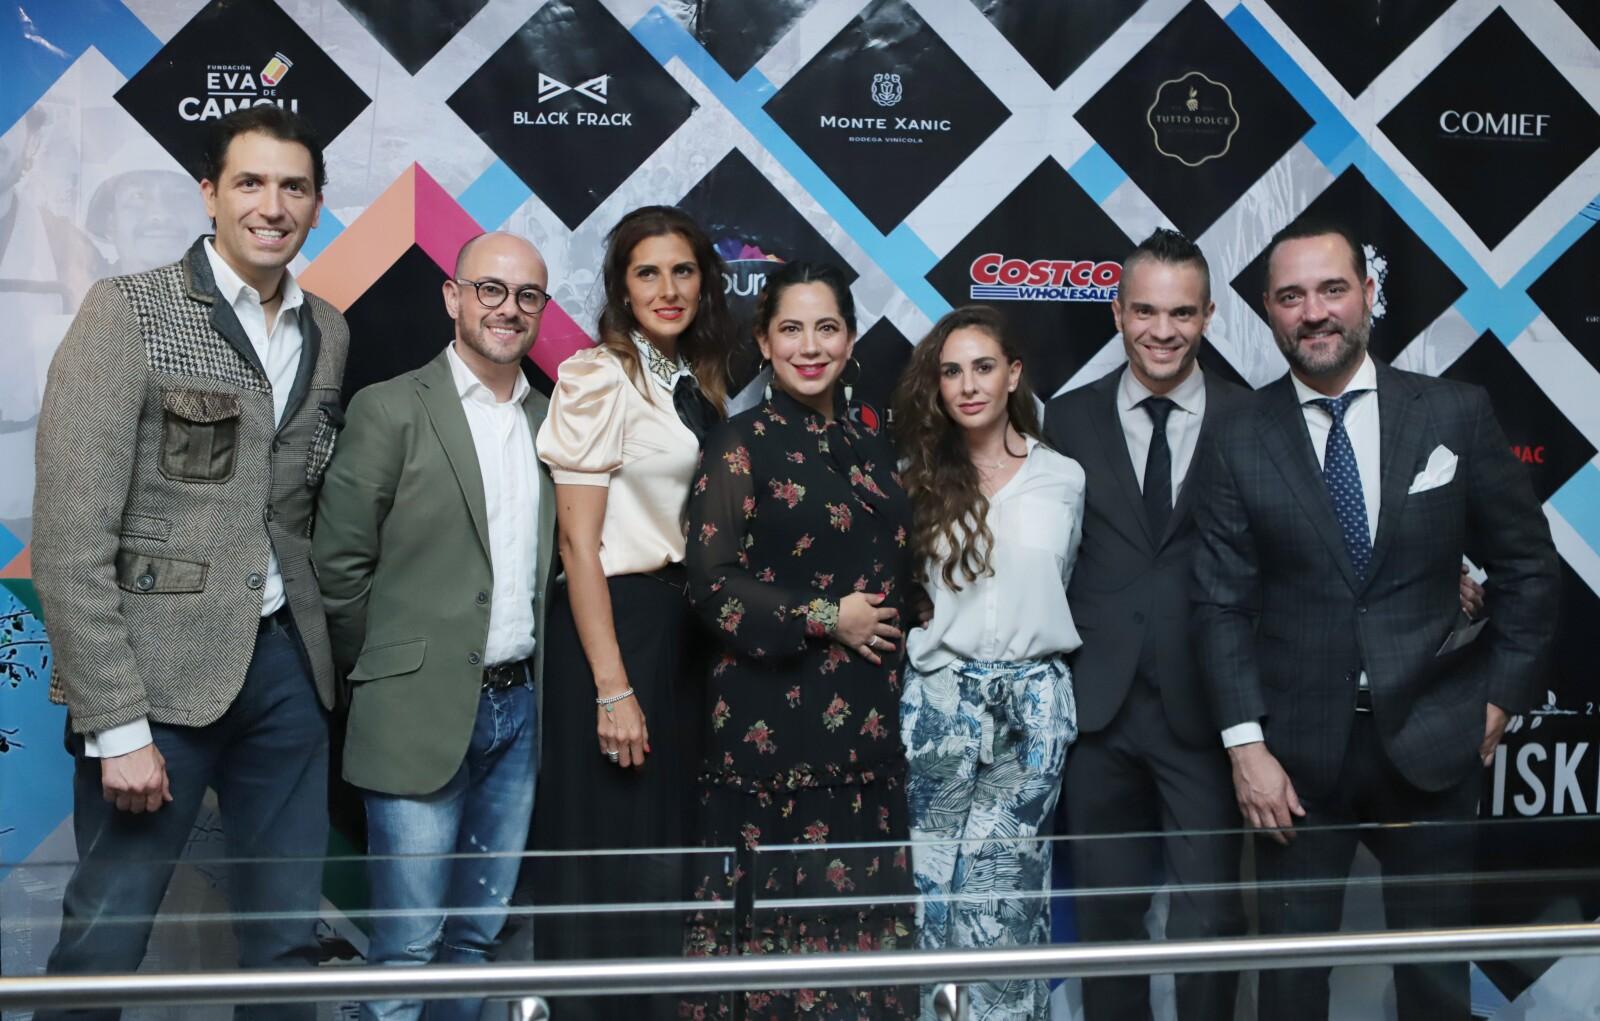 Arturo Cornejo, Guillermo Serrano, Paulina Feria, Lizeth Castro, Ximena Suarez,Kuno Becker, Miguel Mier.JPG